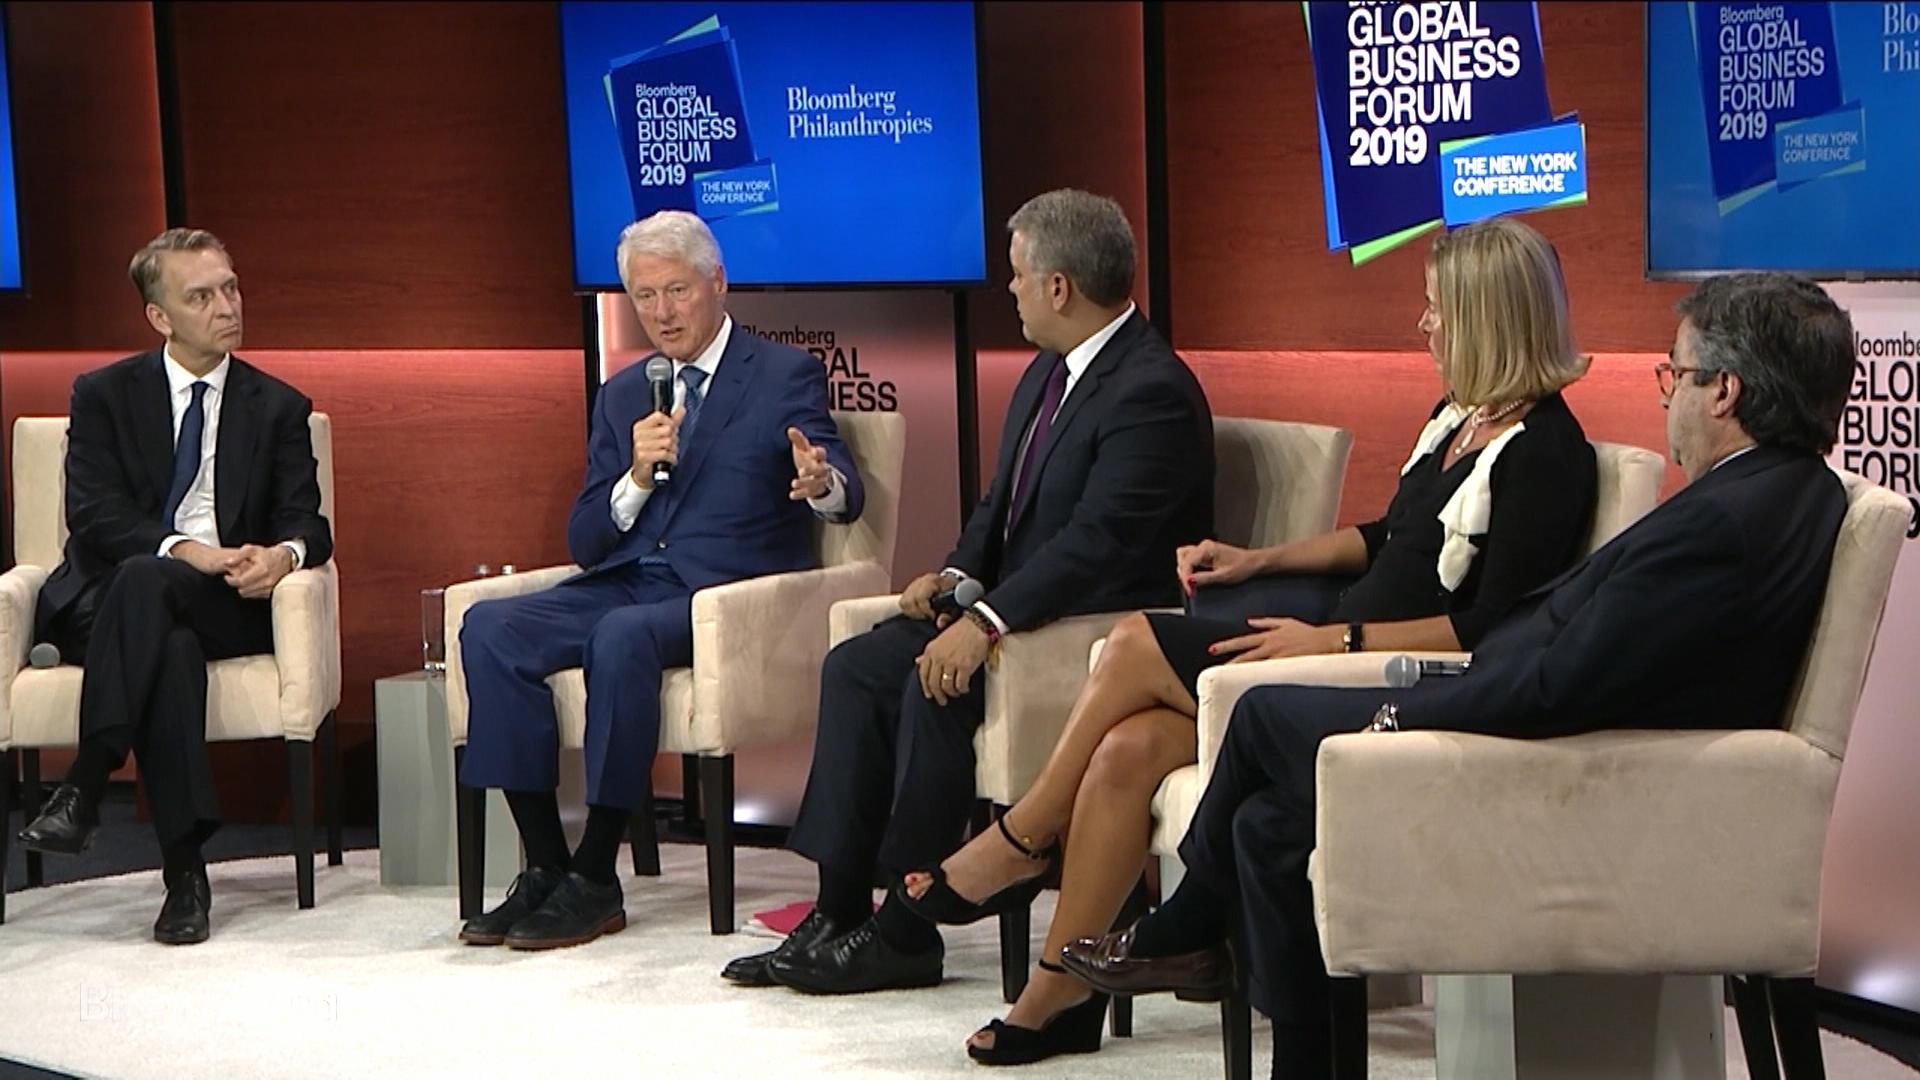 Clinton, Duque, Mogherini at GBF 2019